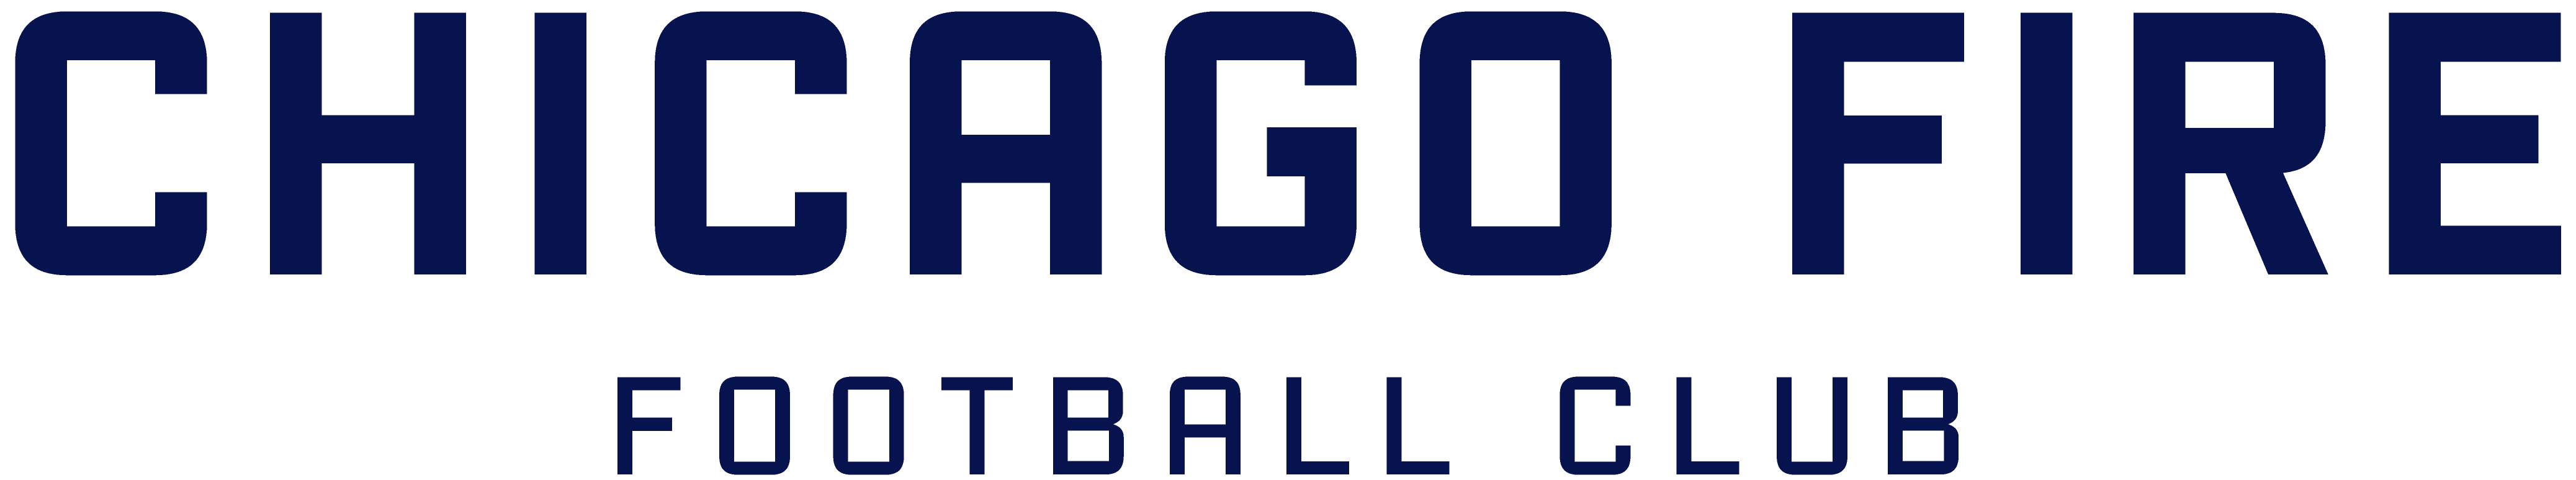 CHICAGO FIRE FOOTBALL CLUB